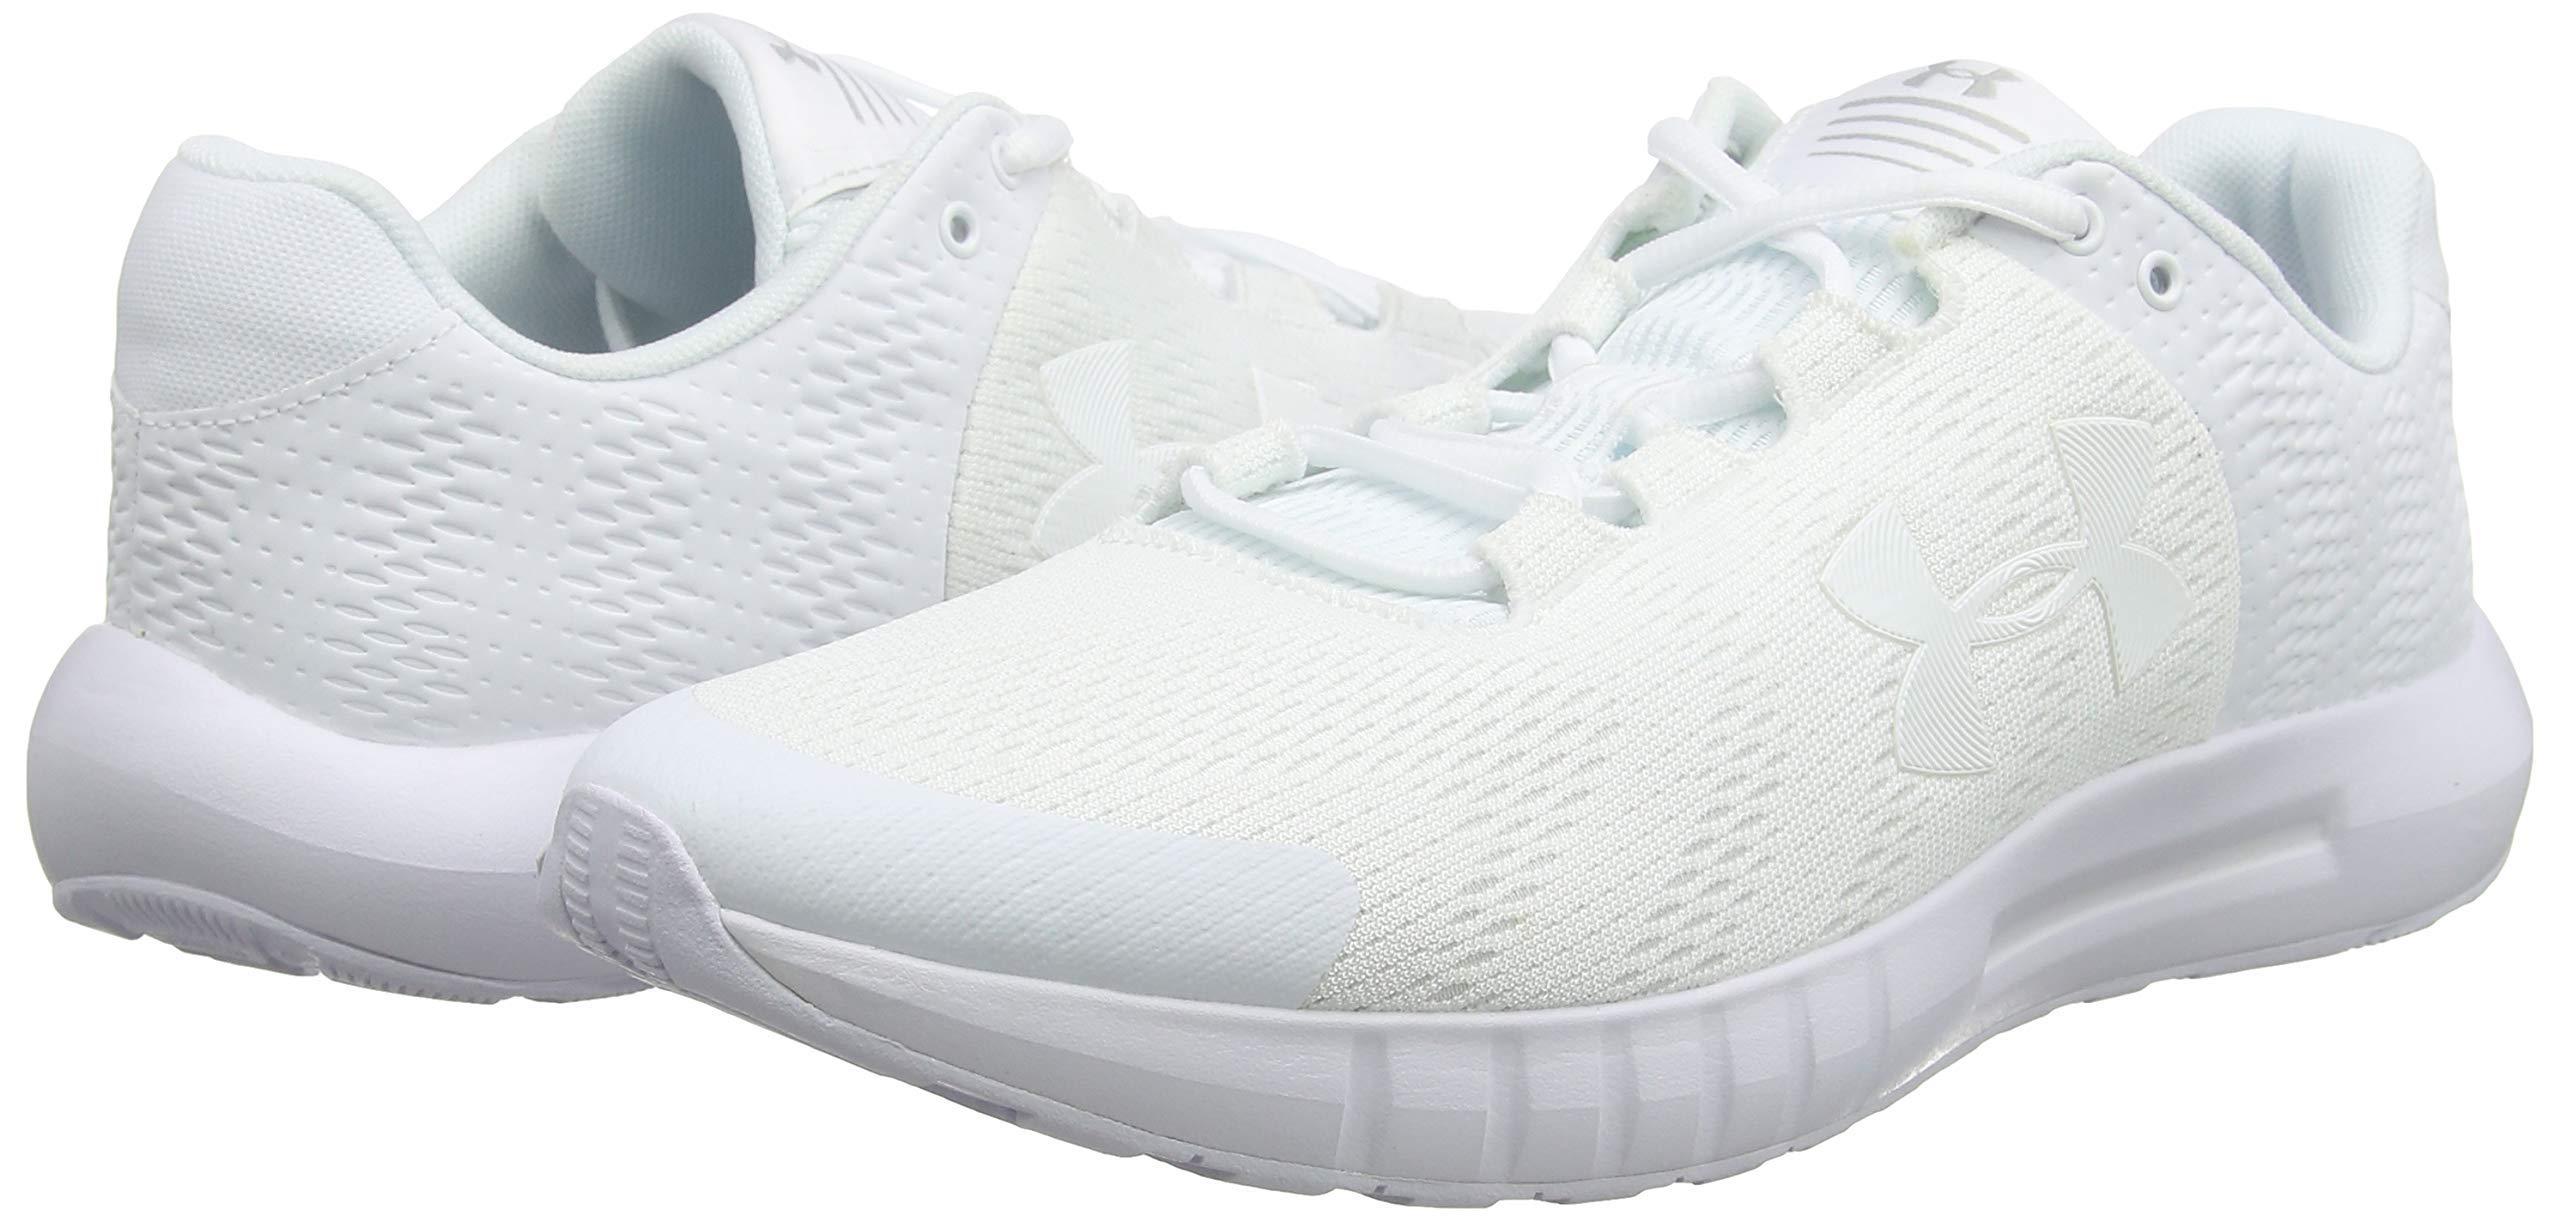 Under Armour Men's Micro G Pursuit BP Running Shoe